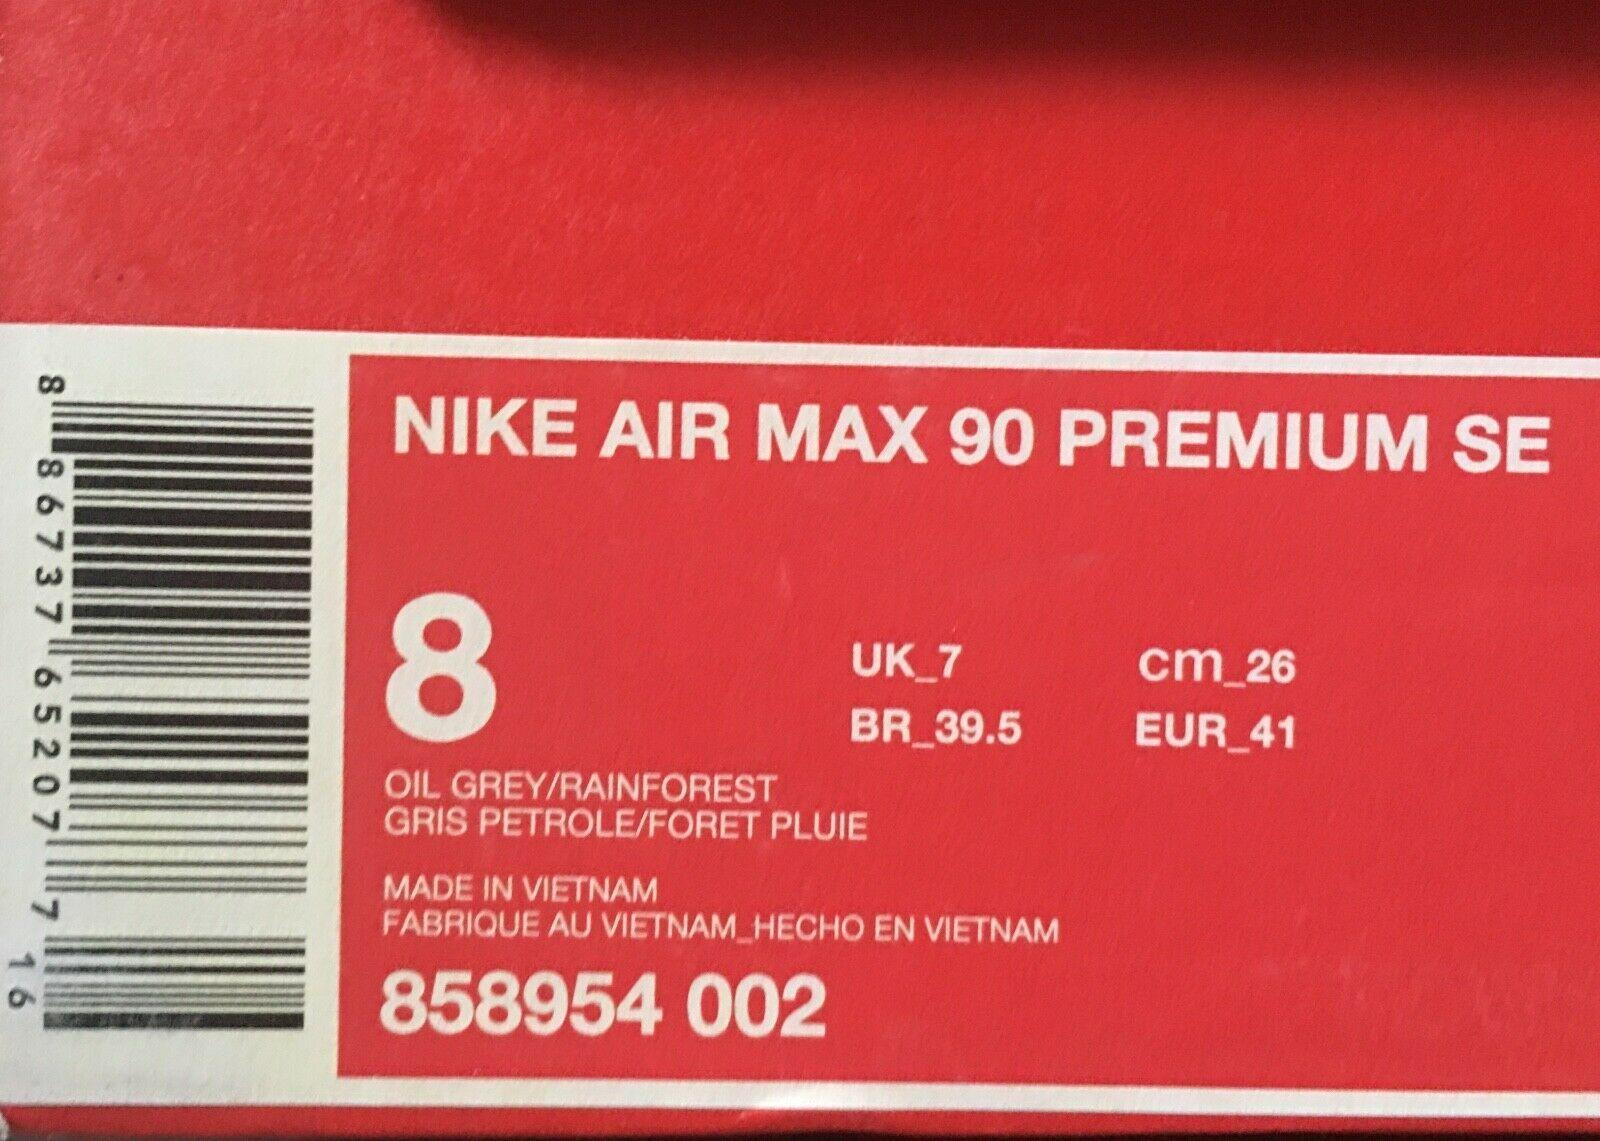 NIB NIKE AIR MAX 90 PREMIUM SE SHOES - Oil Grey / Rainforest sz US 8